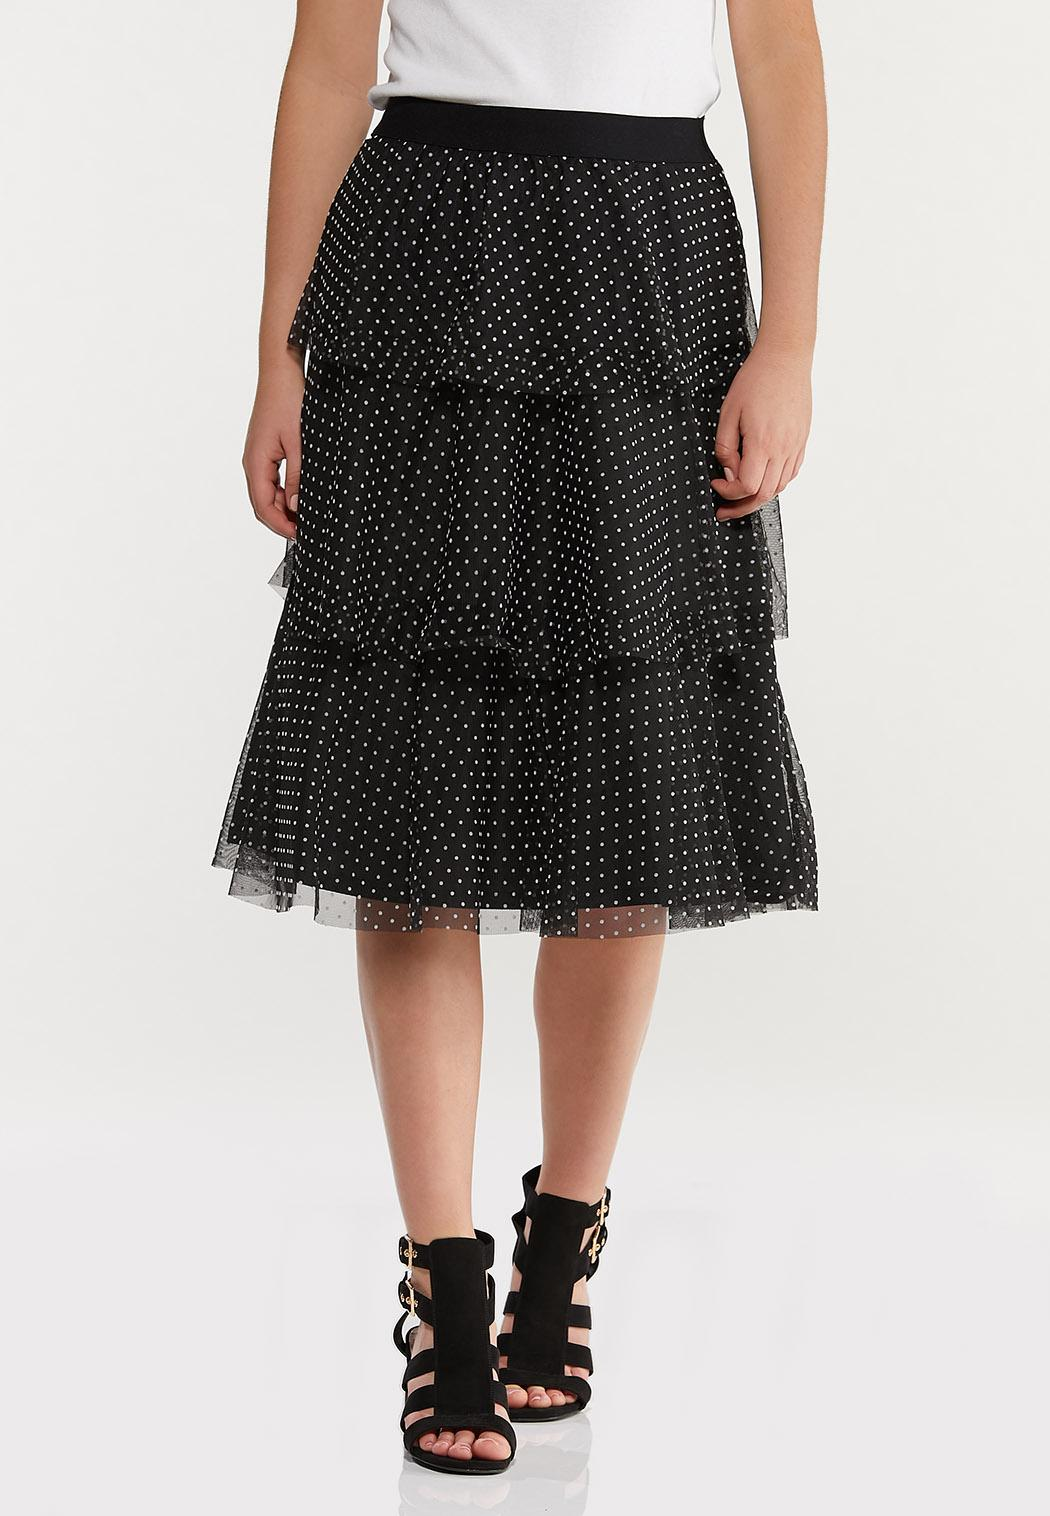 Tiered Polka Dot Skirt (Item #44469722)